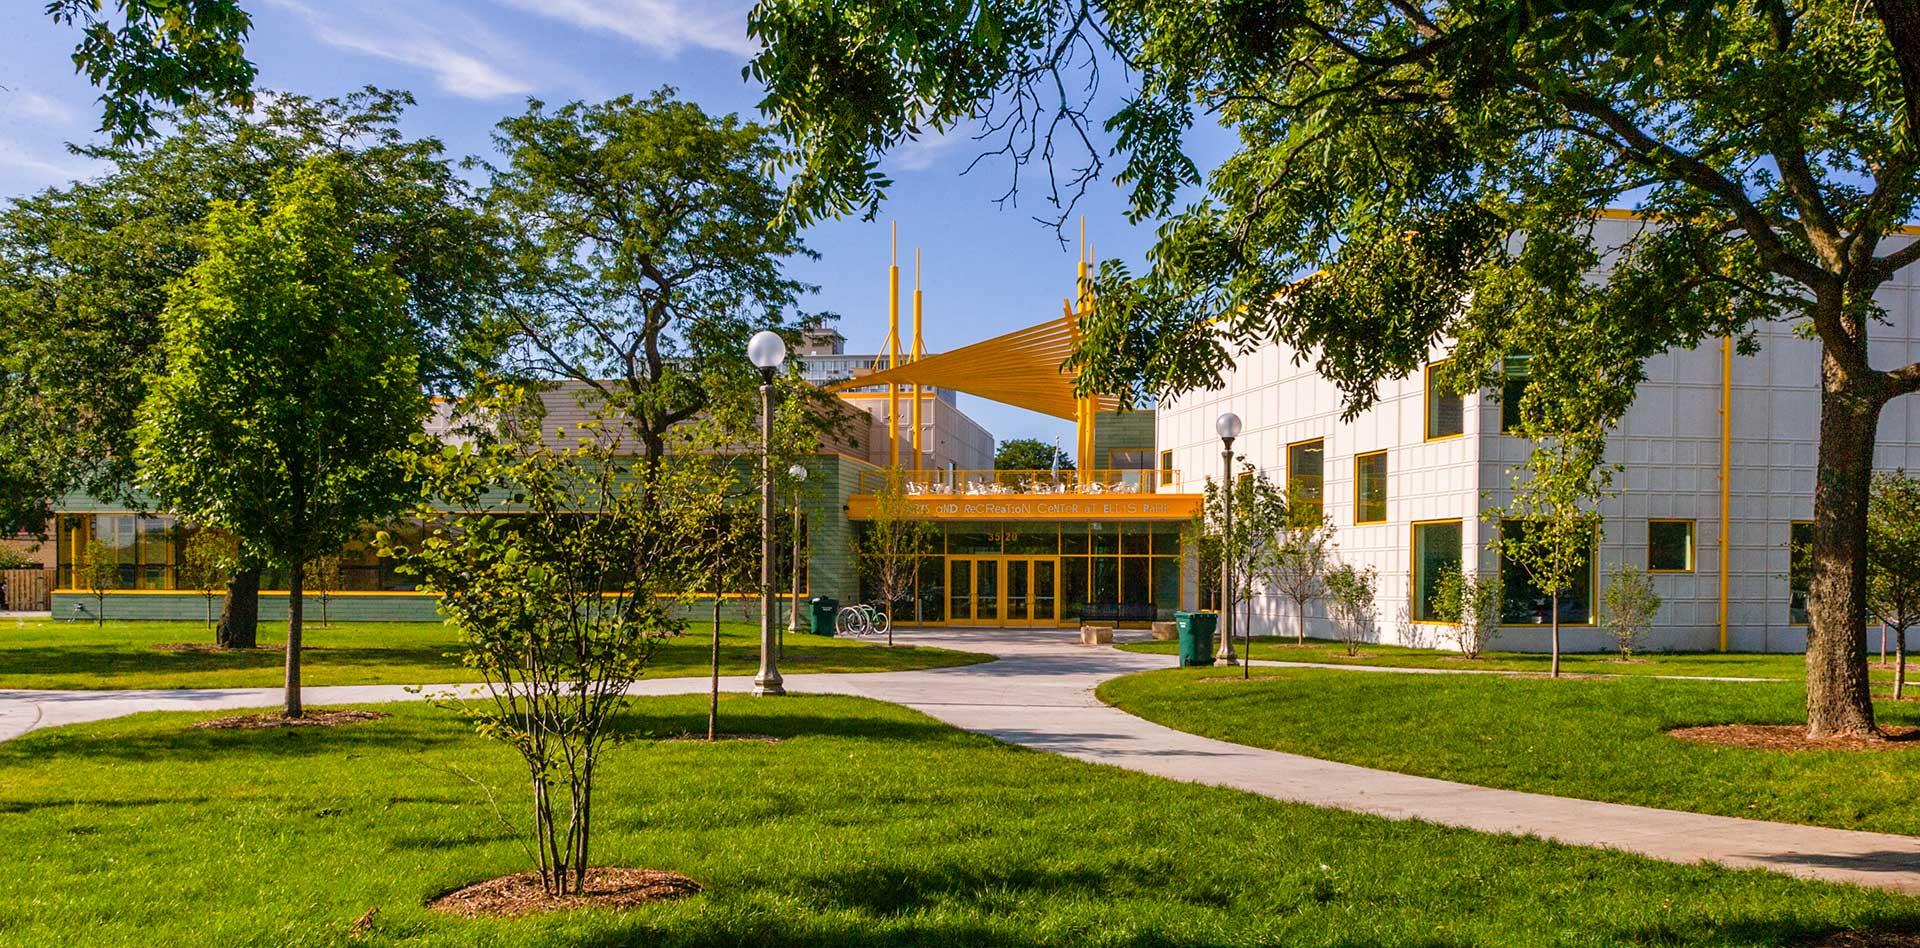 Exterior of the Arts & Recreation Center at Ellis Park